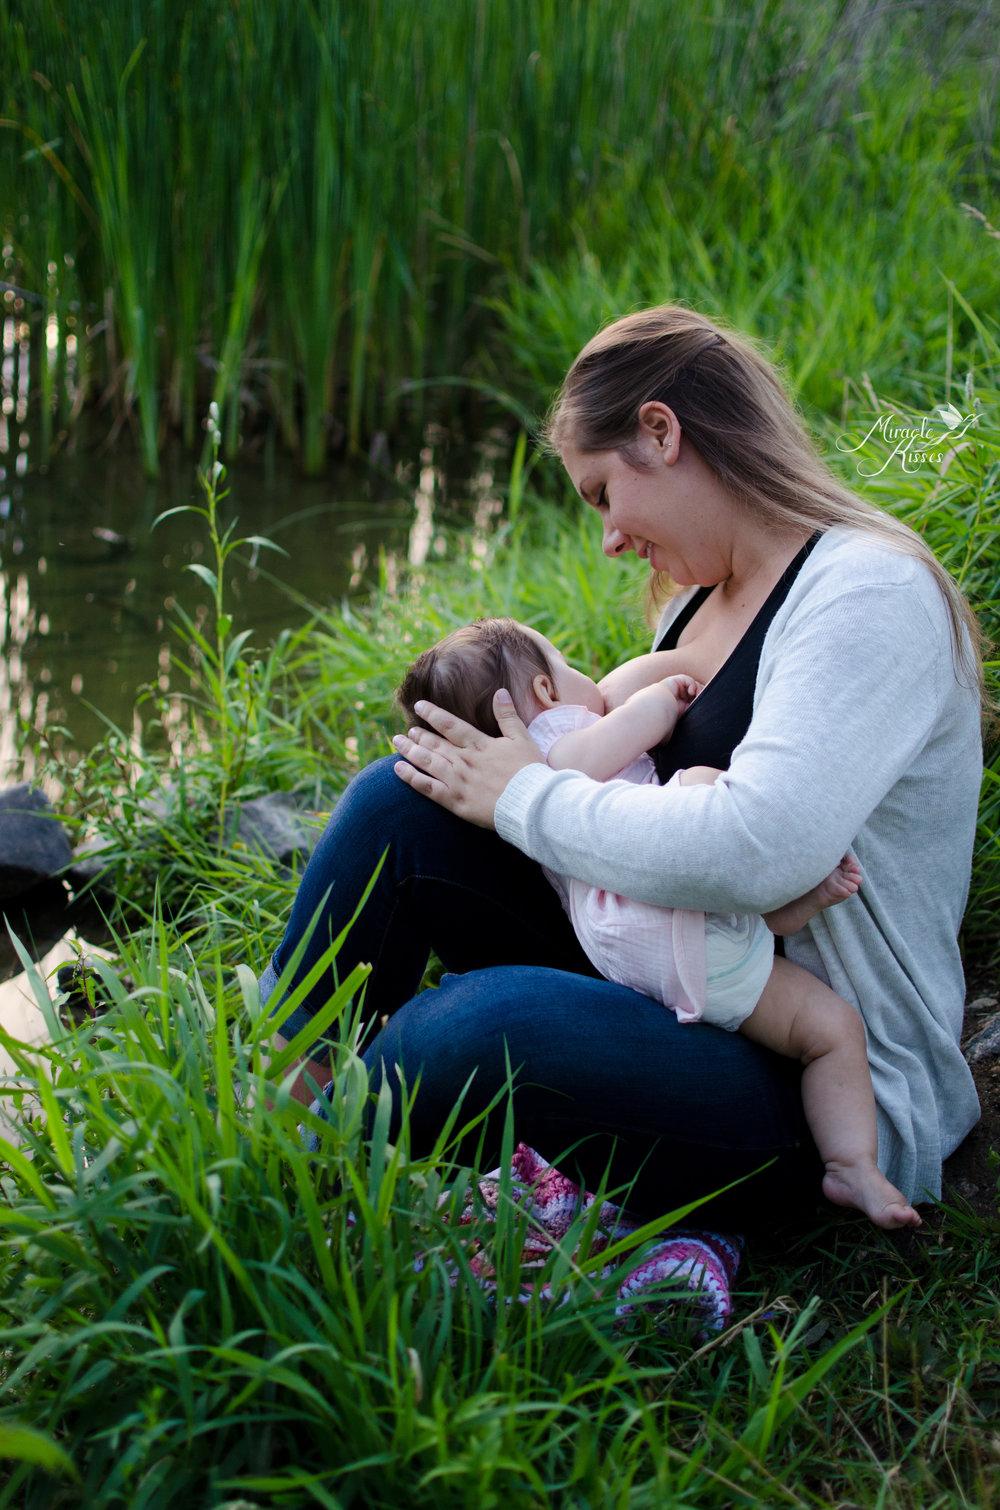 breastfeeding in nature, nursing in public, normalize breastfeeding